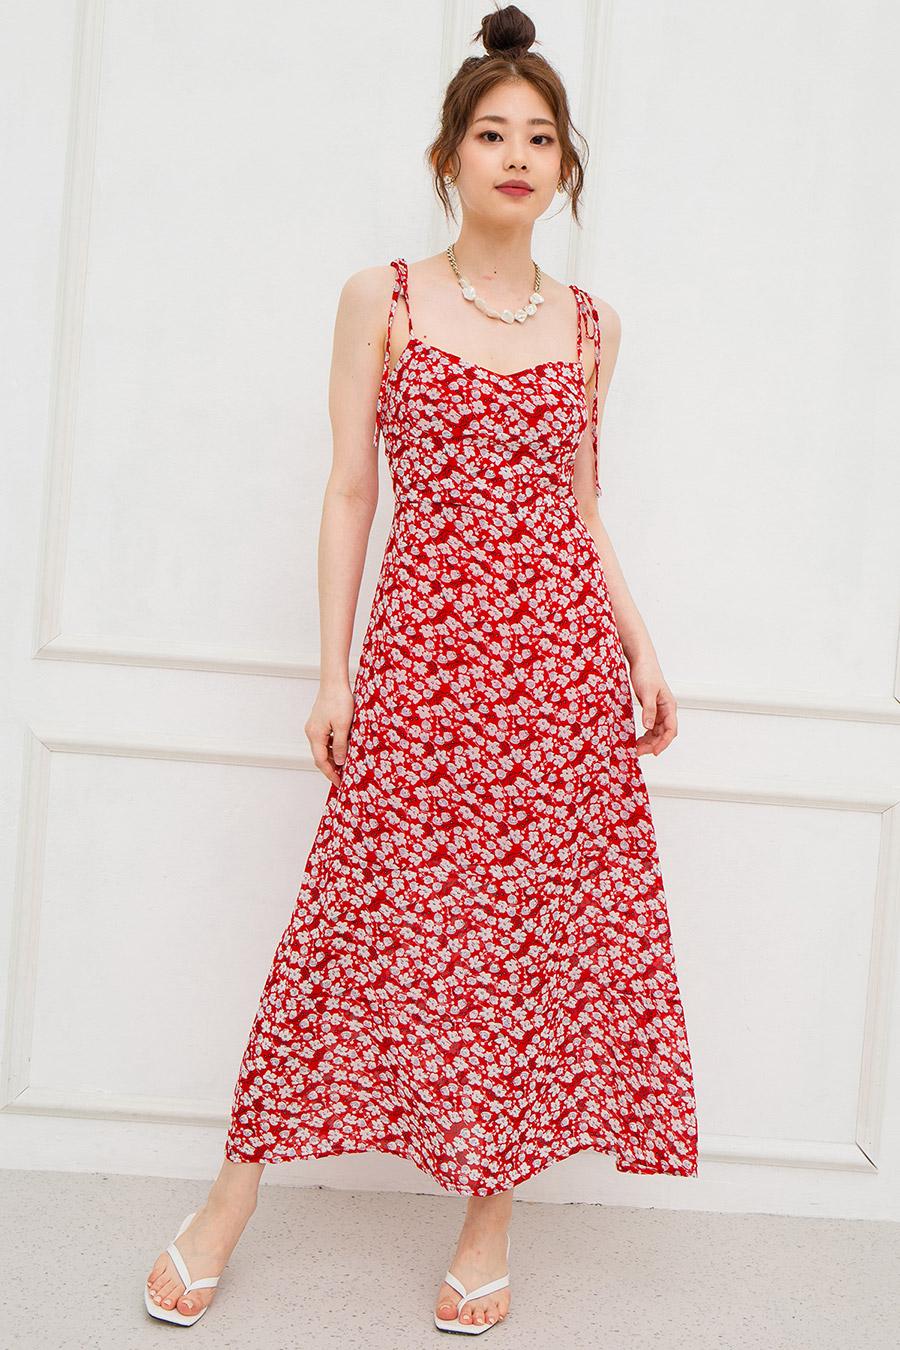 SALOMON DRESS - SCARLET FLEUR